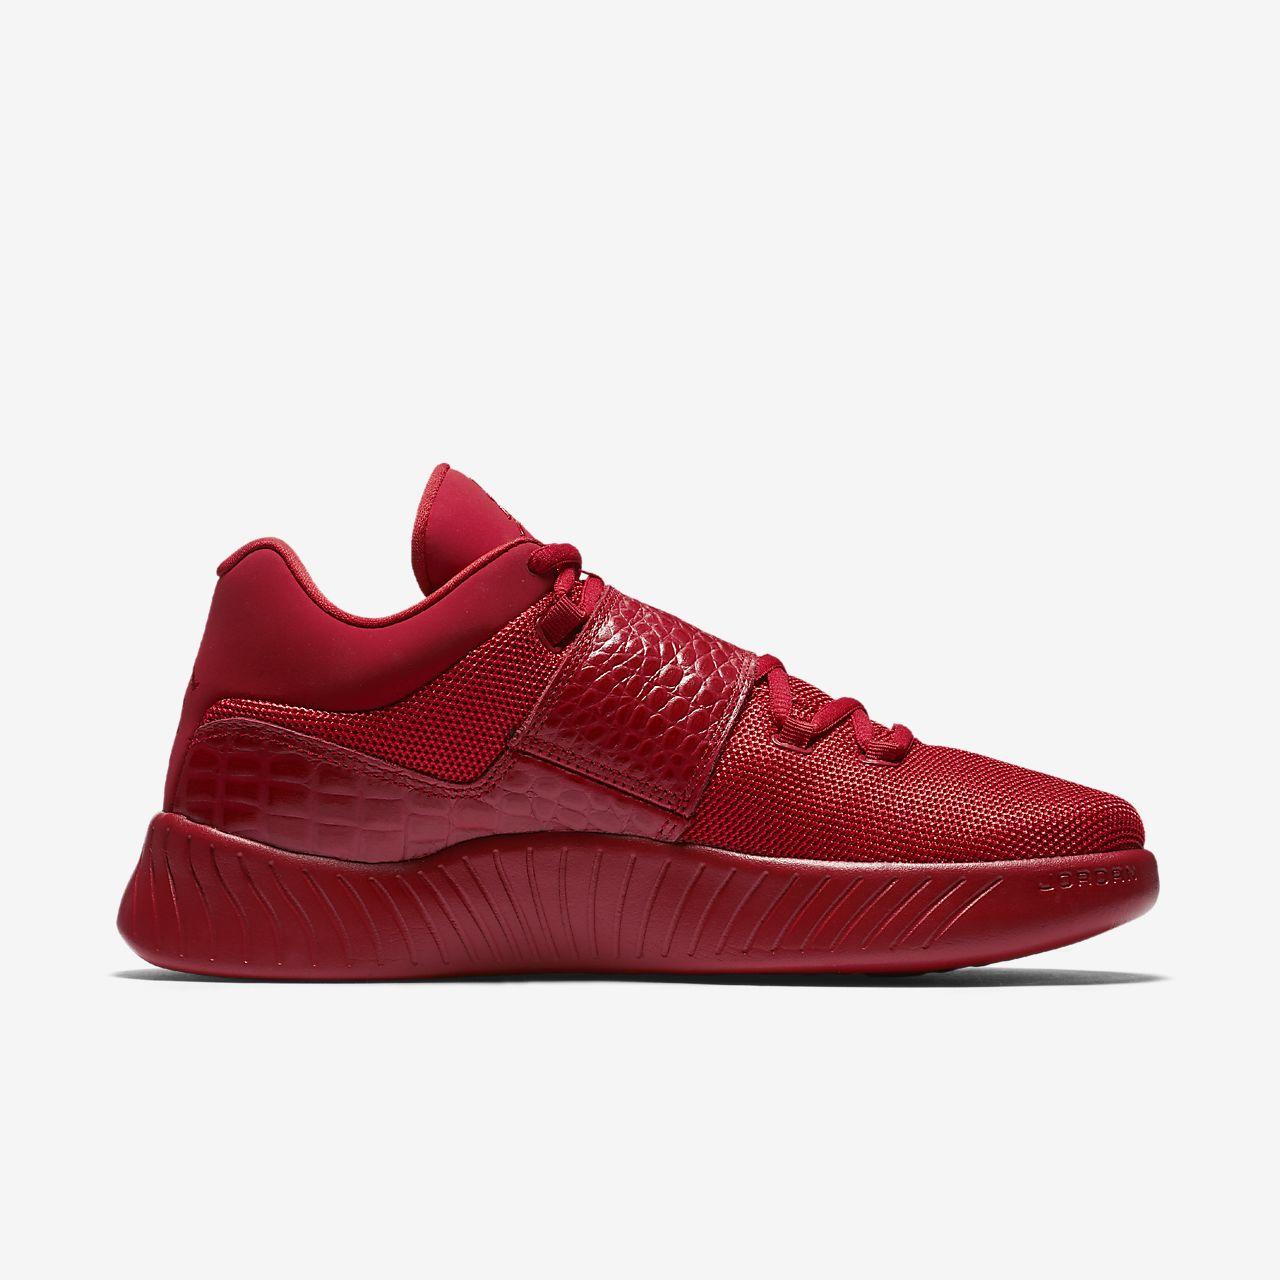 Nike Jordan J23 Low Taglia UK 9 EURO 44